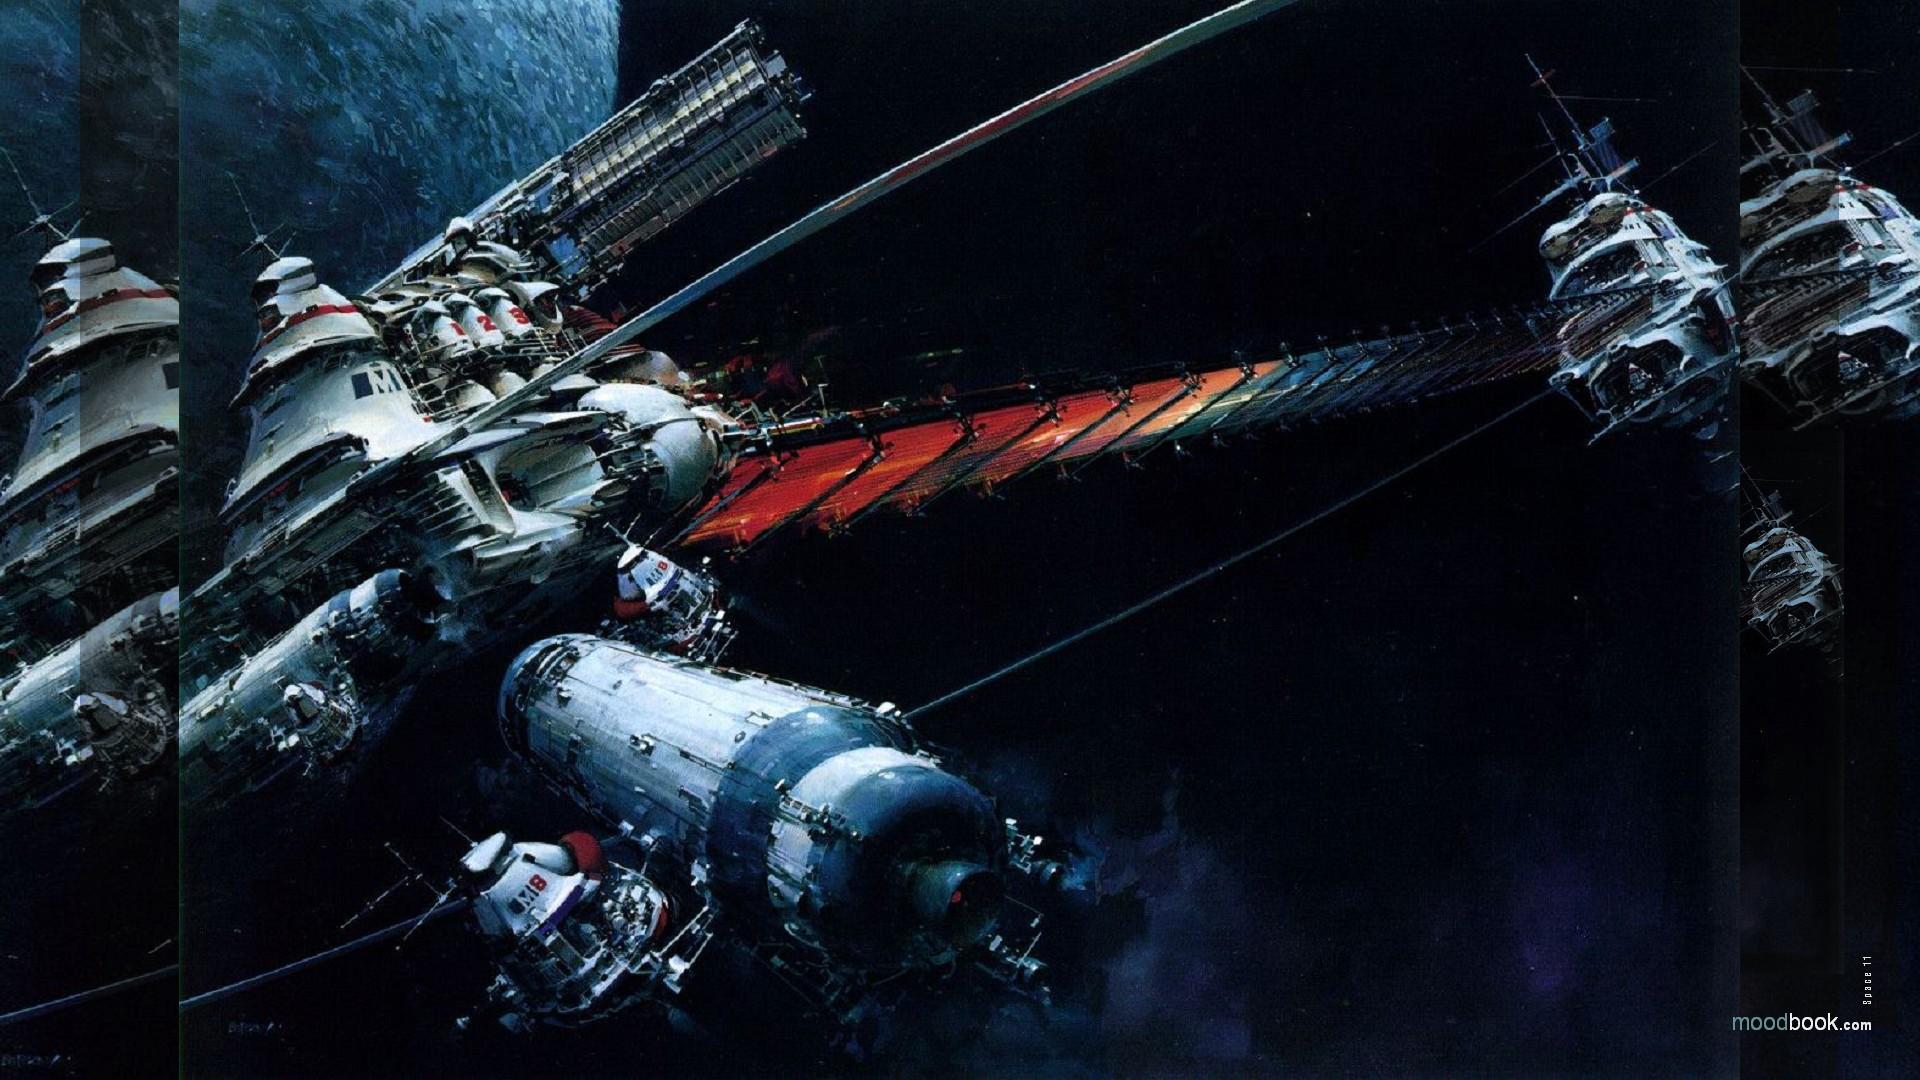 47 retro sci fi wallpaper on wallpapersafari - Vintage space wallpaper ...